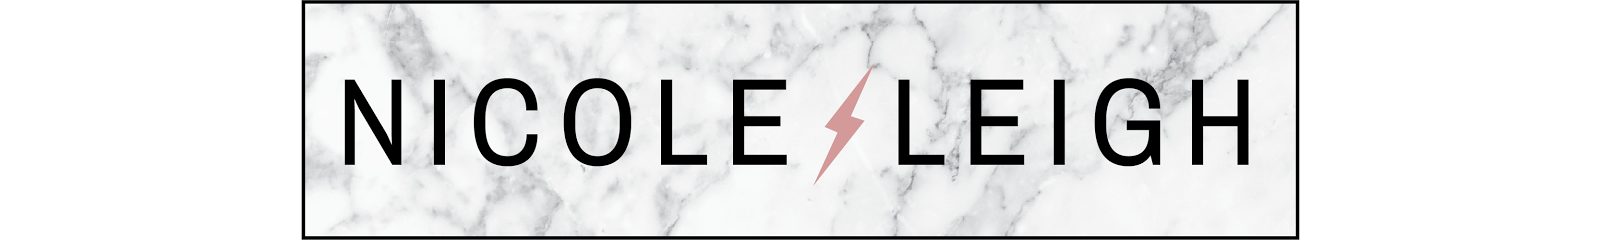 NICOLE LEIGH | LIFE ➕ STYLE BLOG